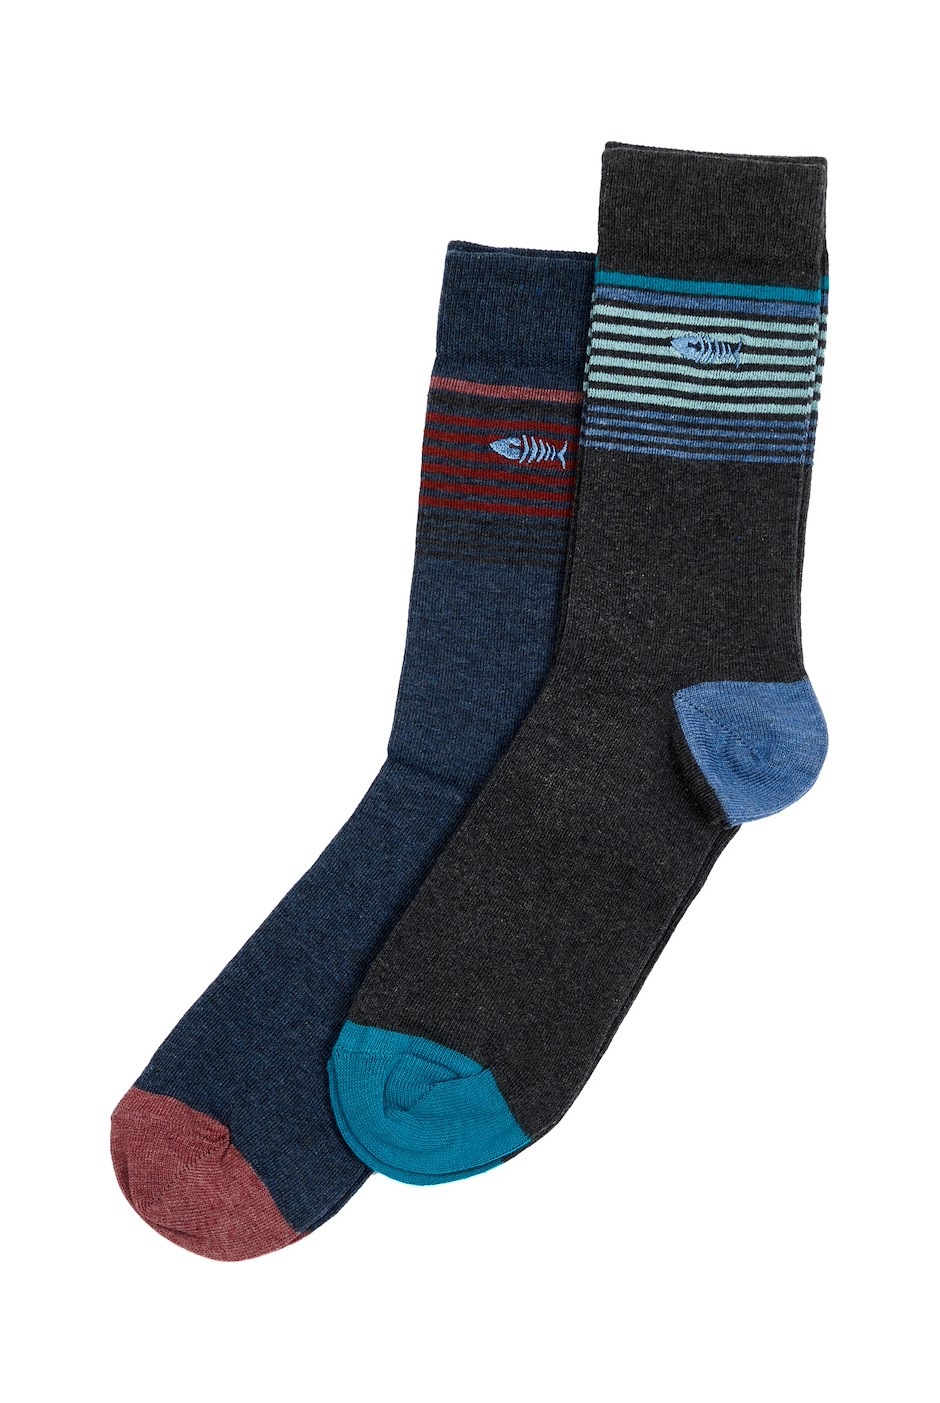 Newport Branded Socks Twin Pack Dark Navy